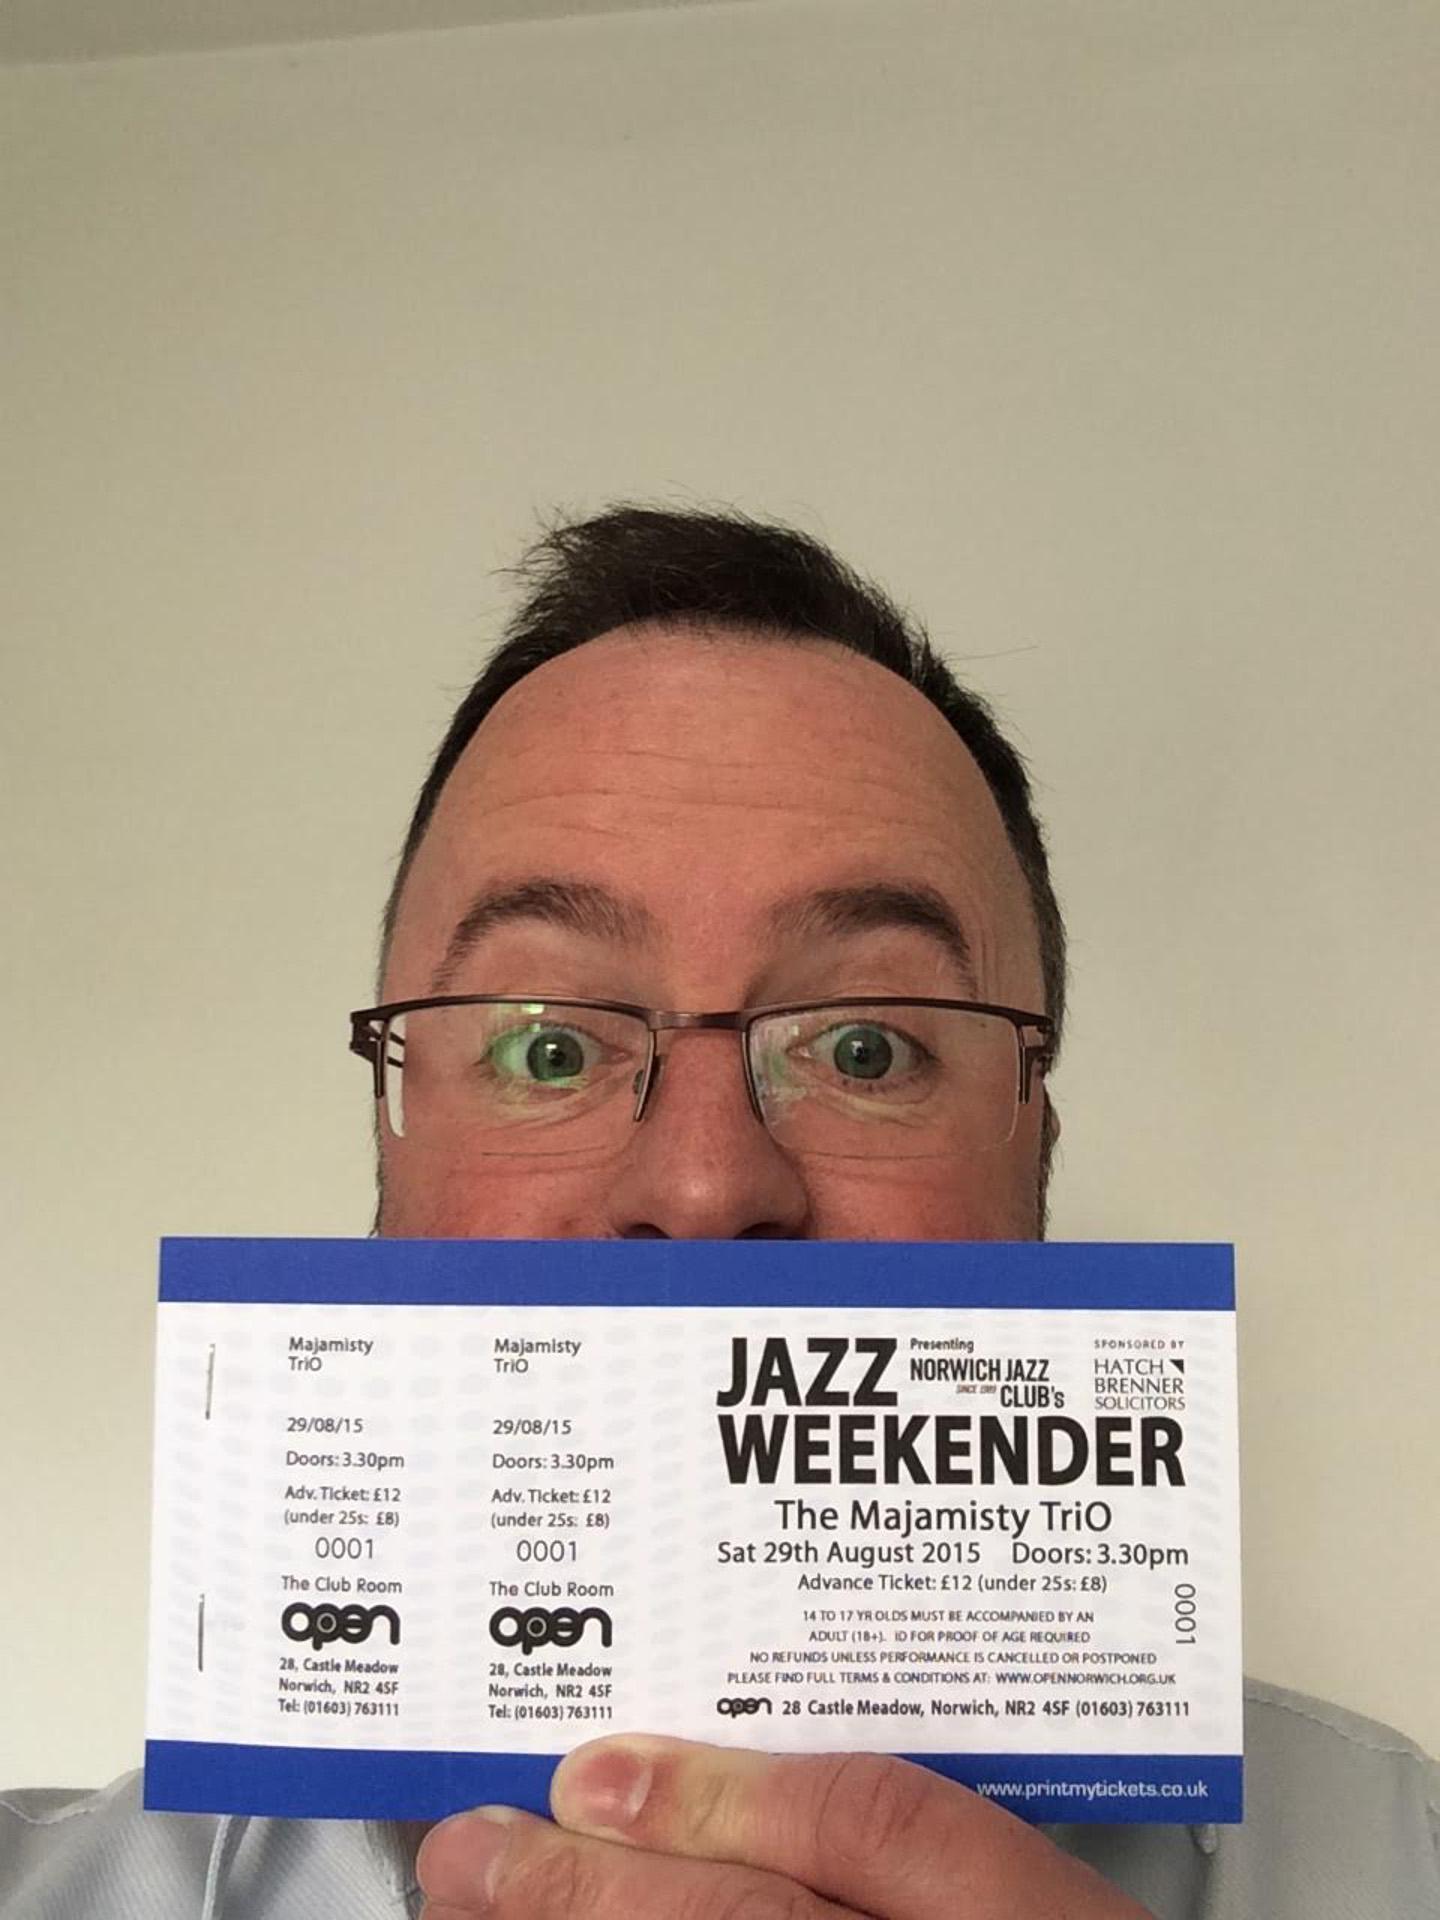 Norwich Jazz weekender, Simon Brown and concert ticket